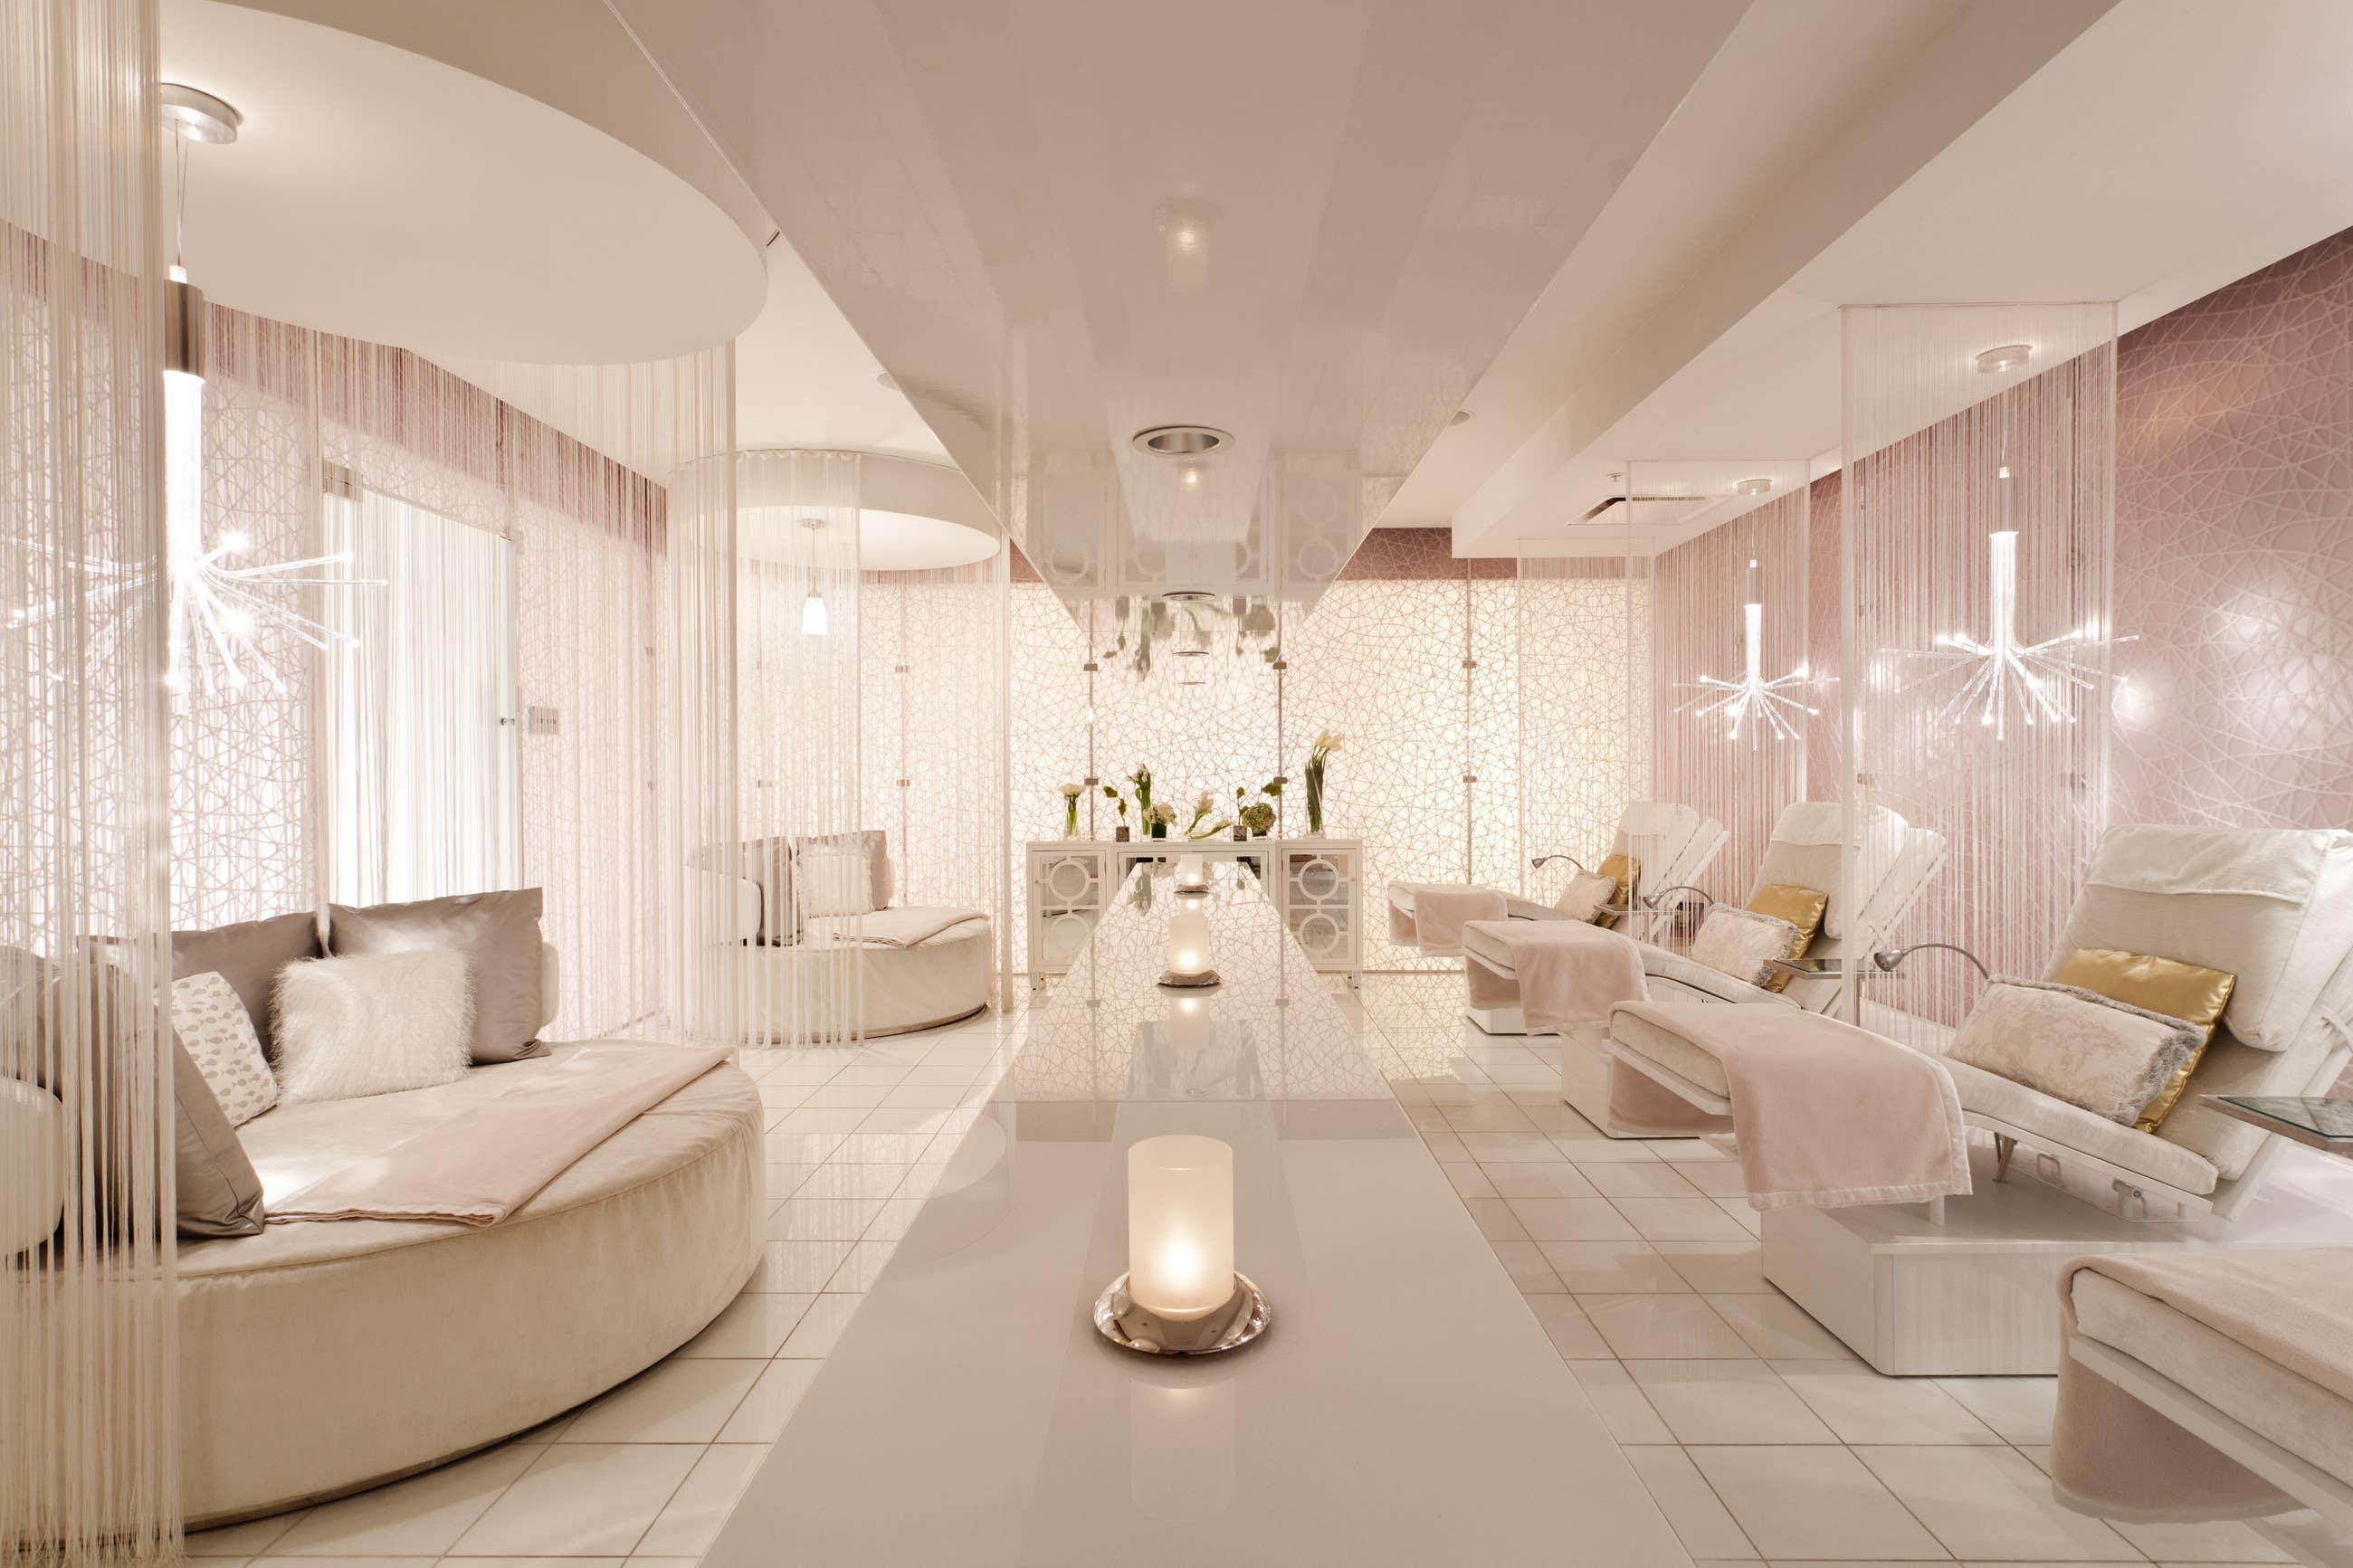 The Ritz-Carlton Spa Los Angeles